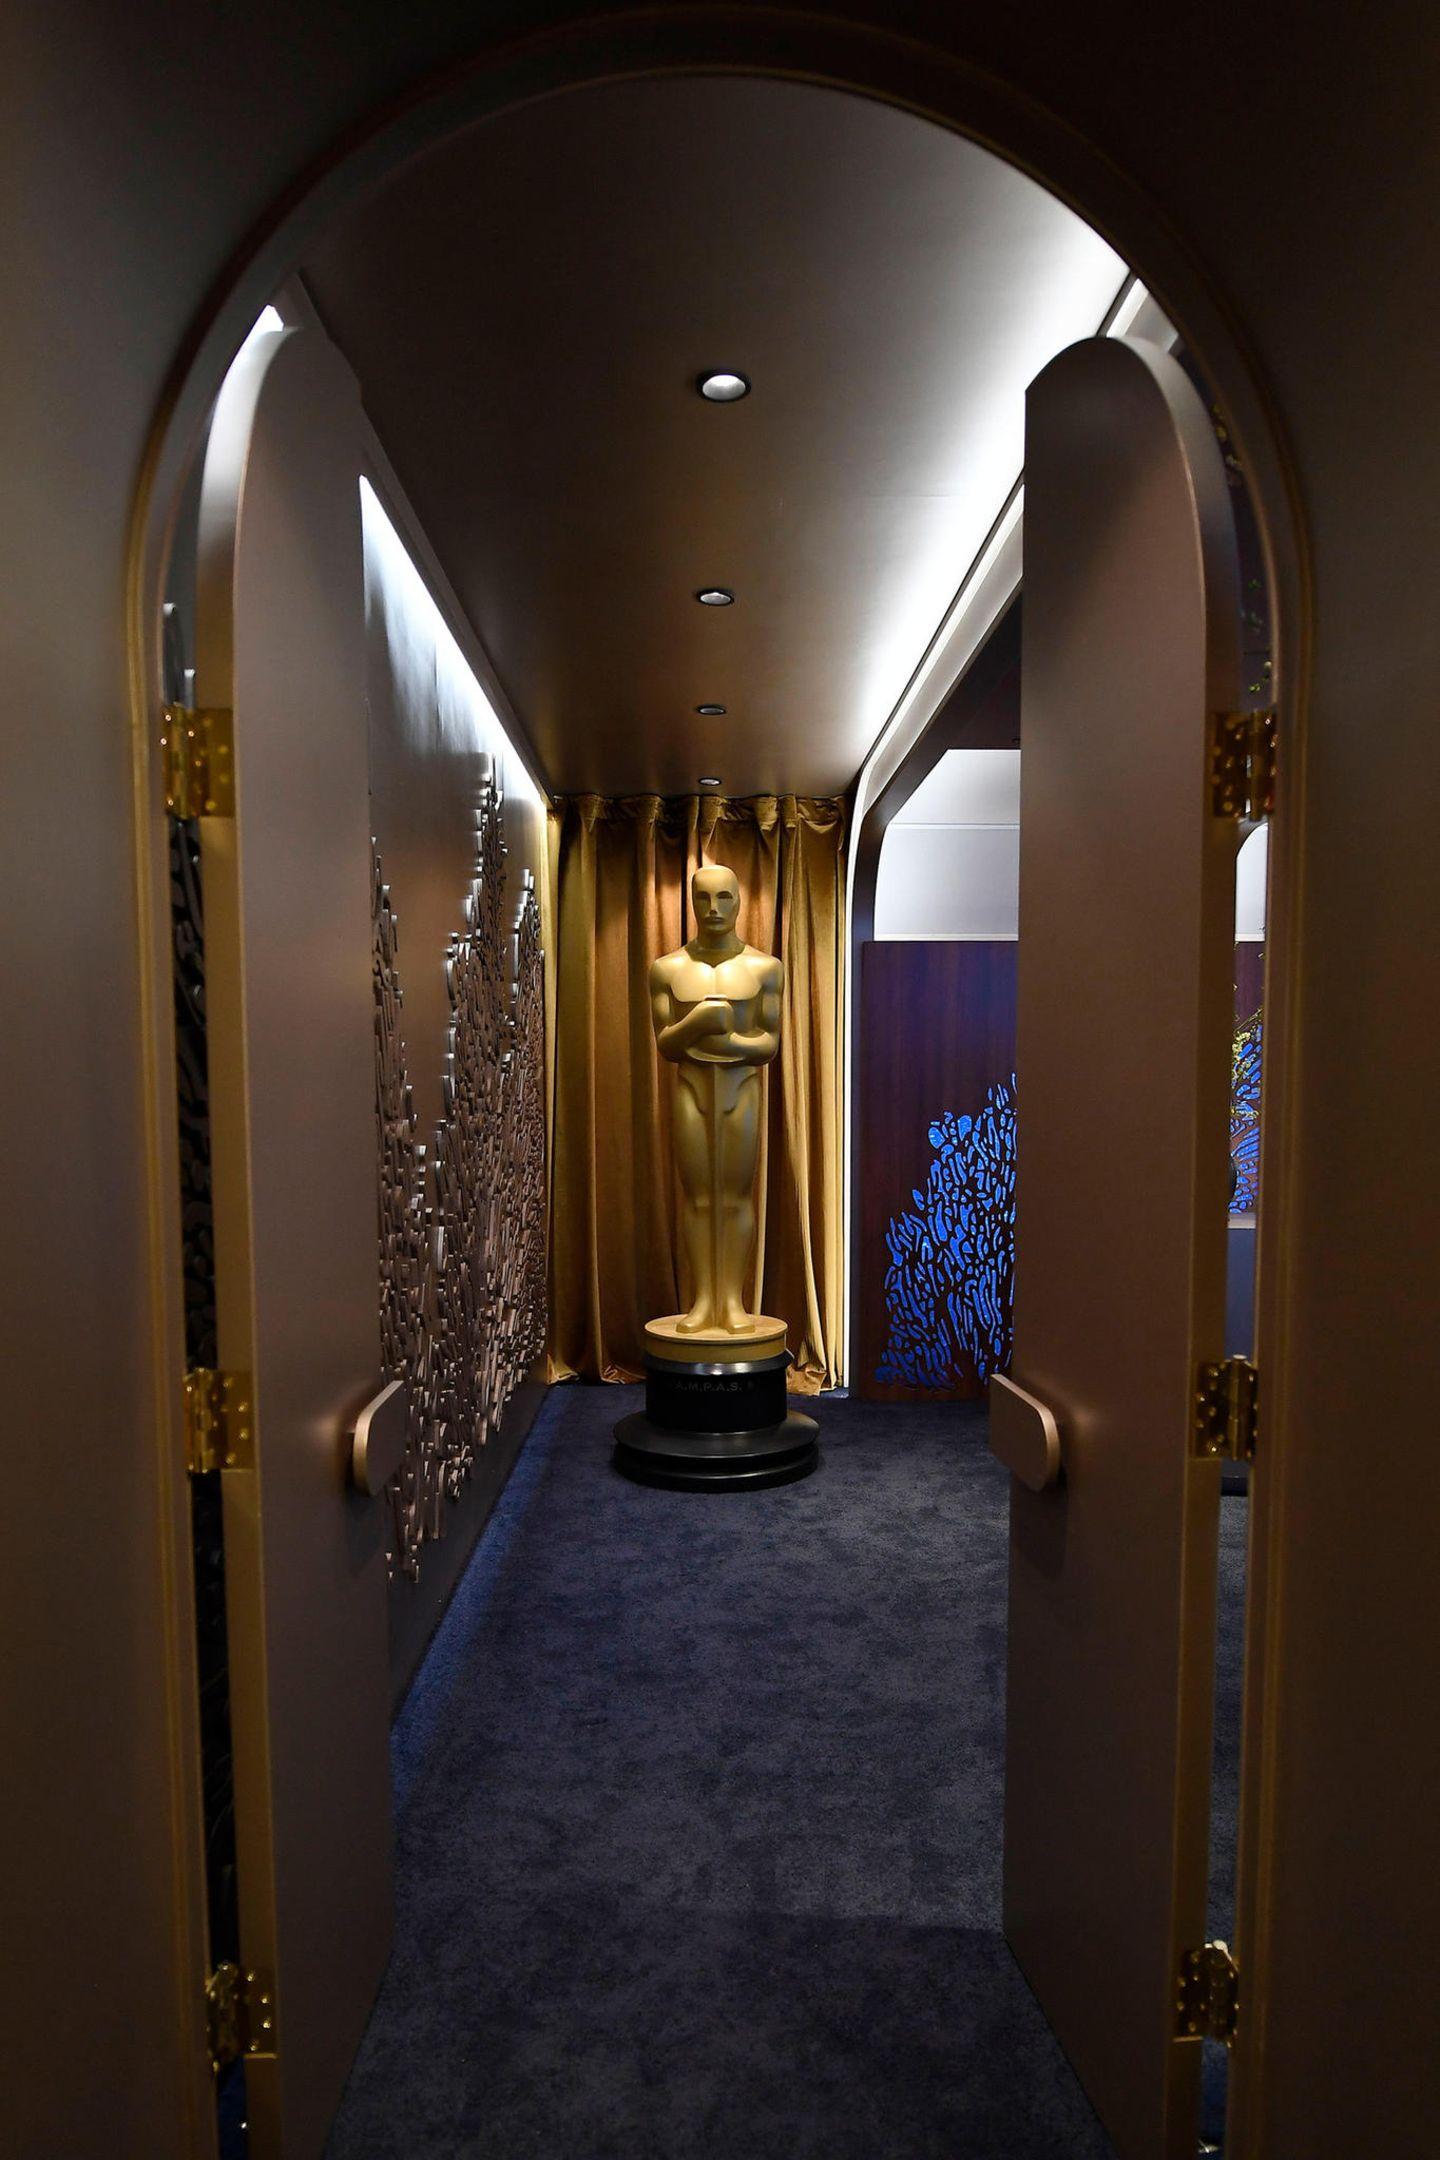 Oscars überall! Auch im berühmtenGreenroom.